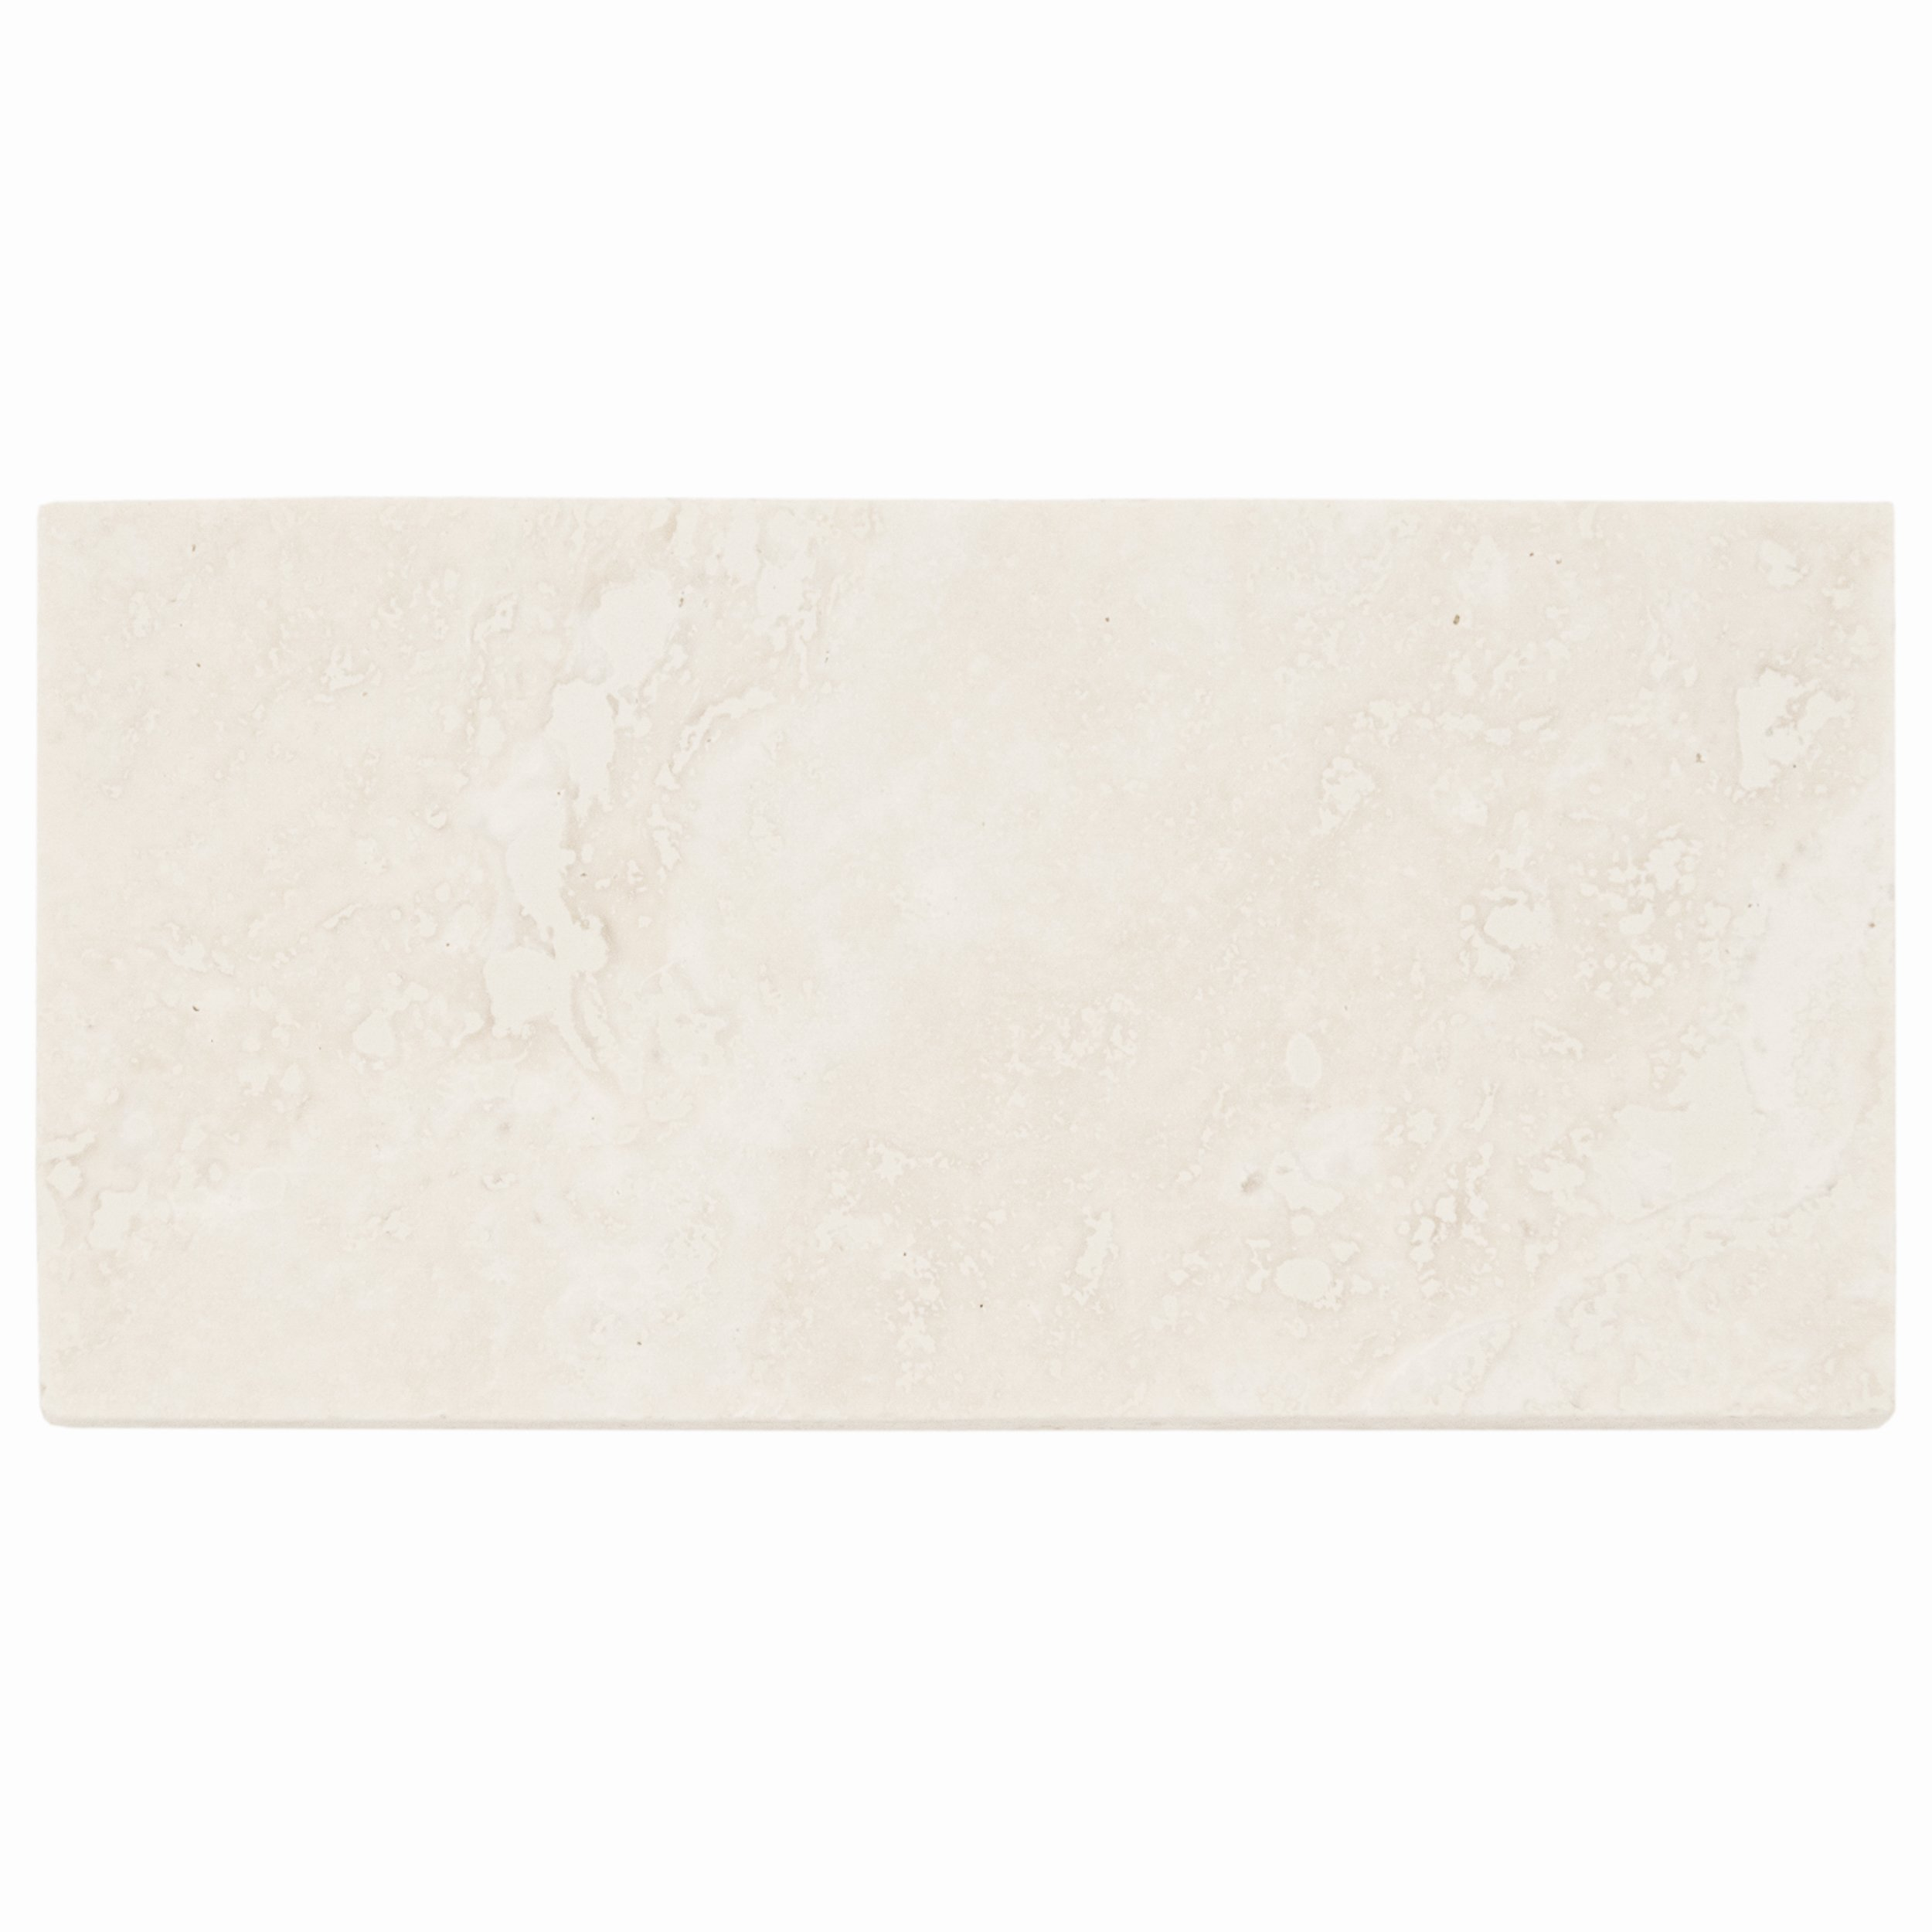 Terra Nuova Brushed Marble Tile 3 X 6 921100638